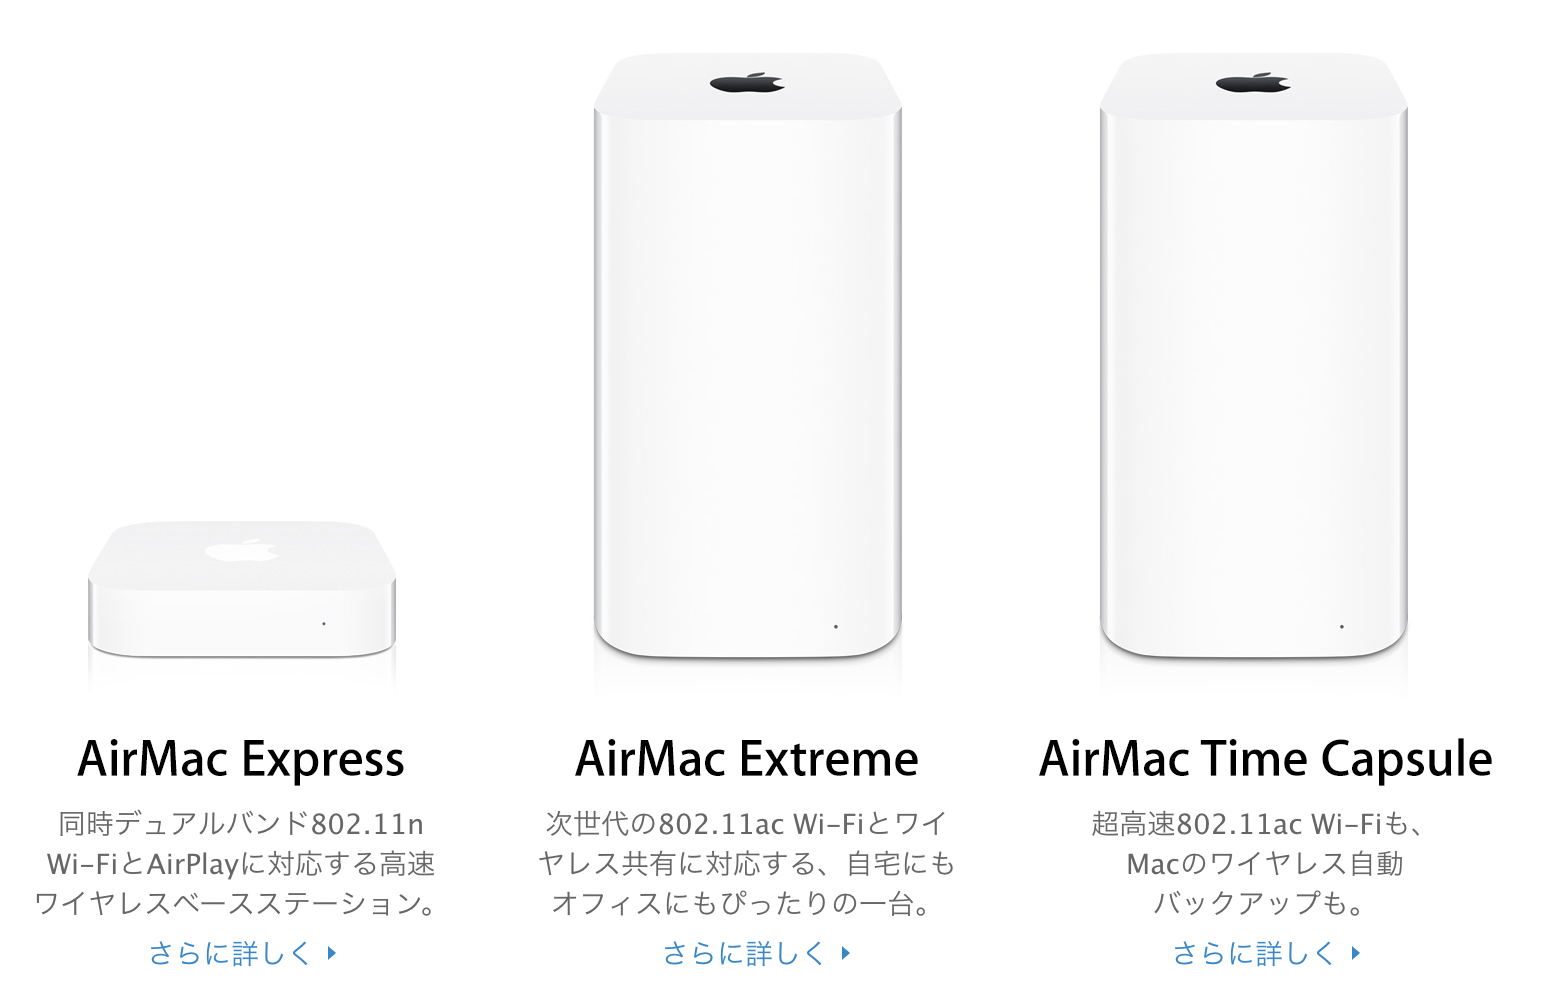 AirMac Extremeの転送速度について比較してみました!Time Capsuleは ...